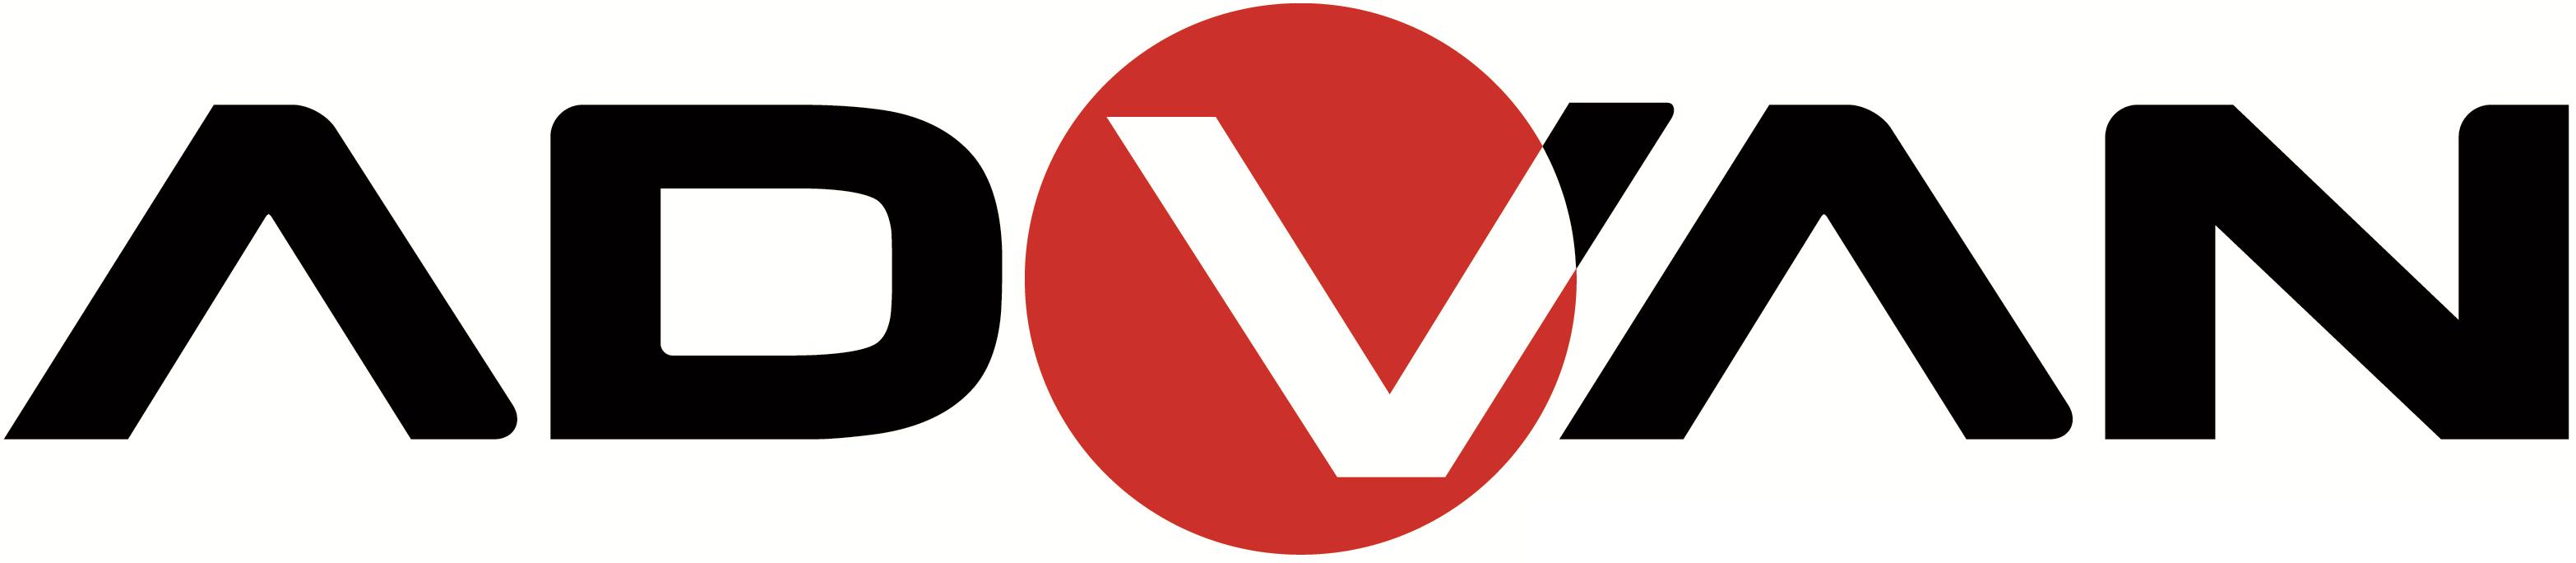 Logo advance png 6 » PNG Image.